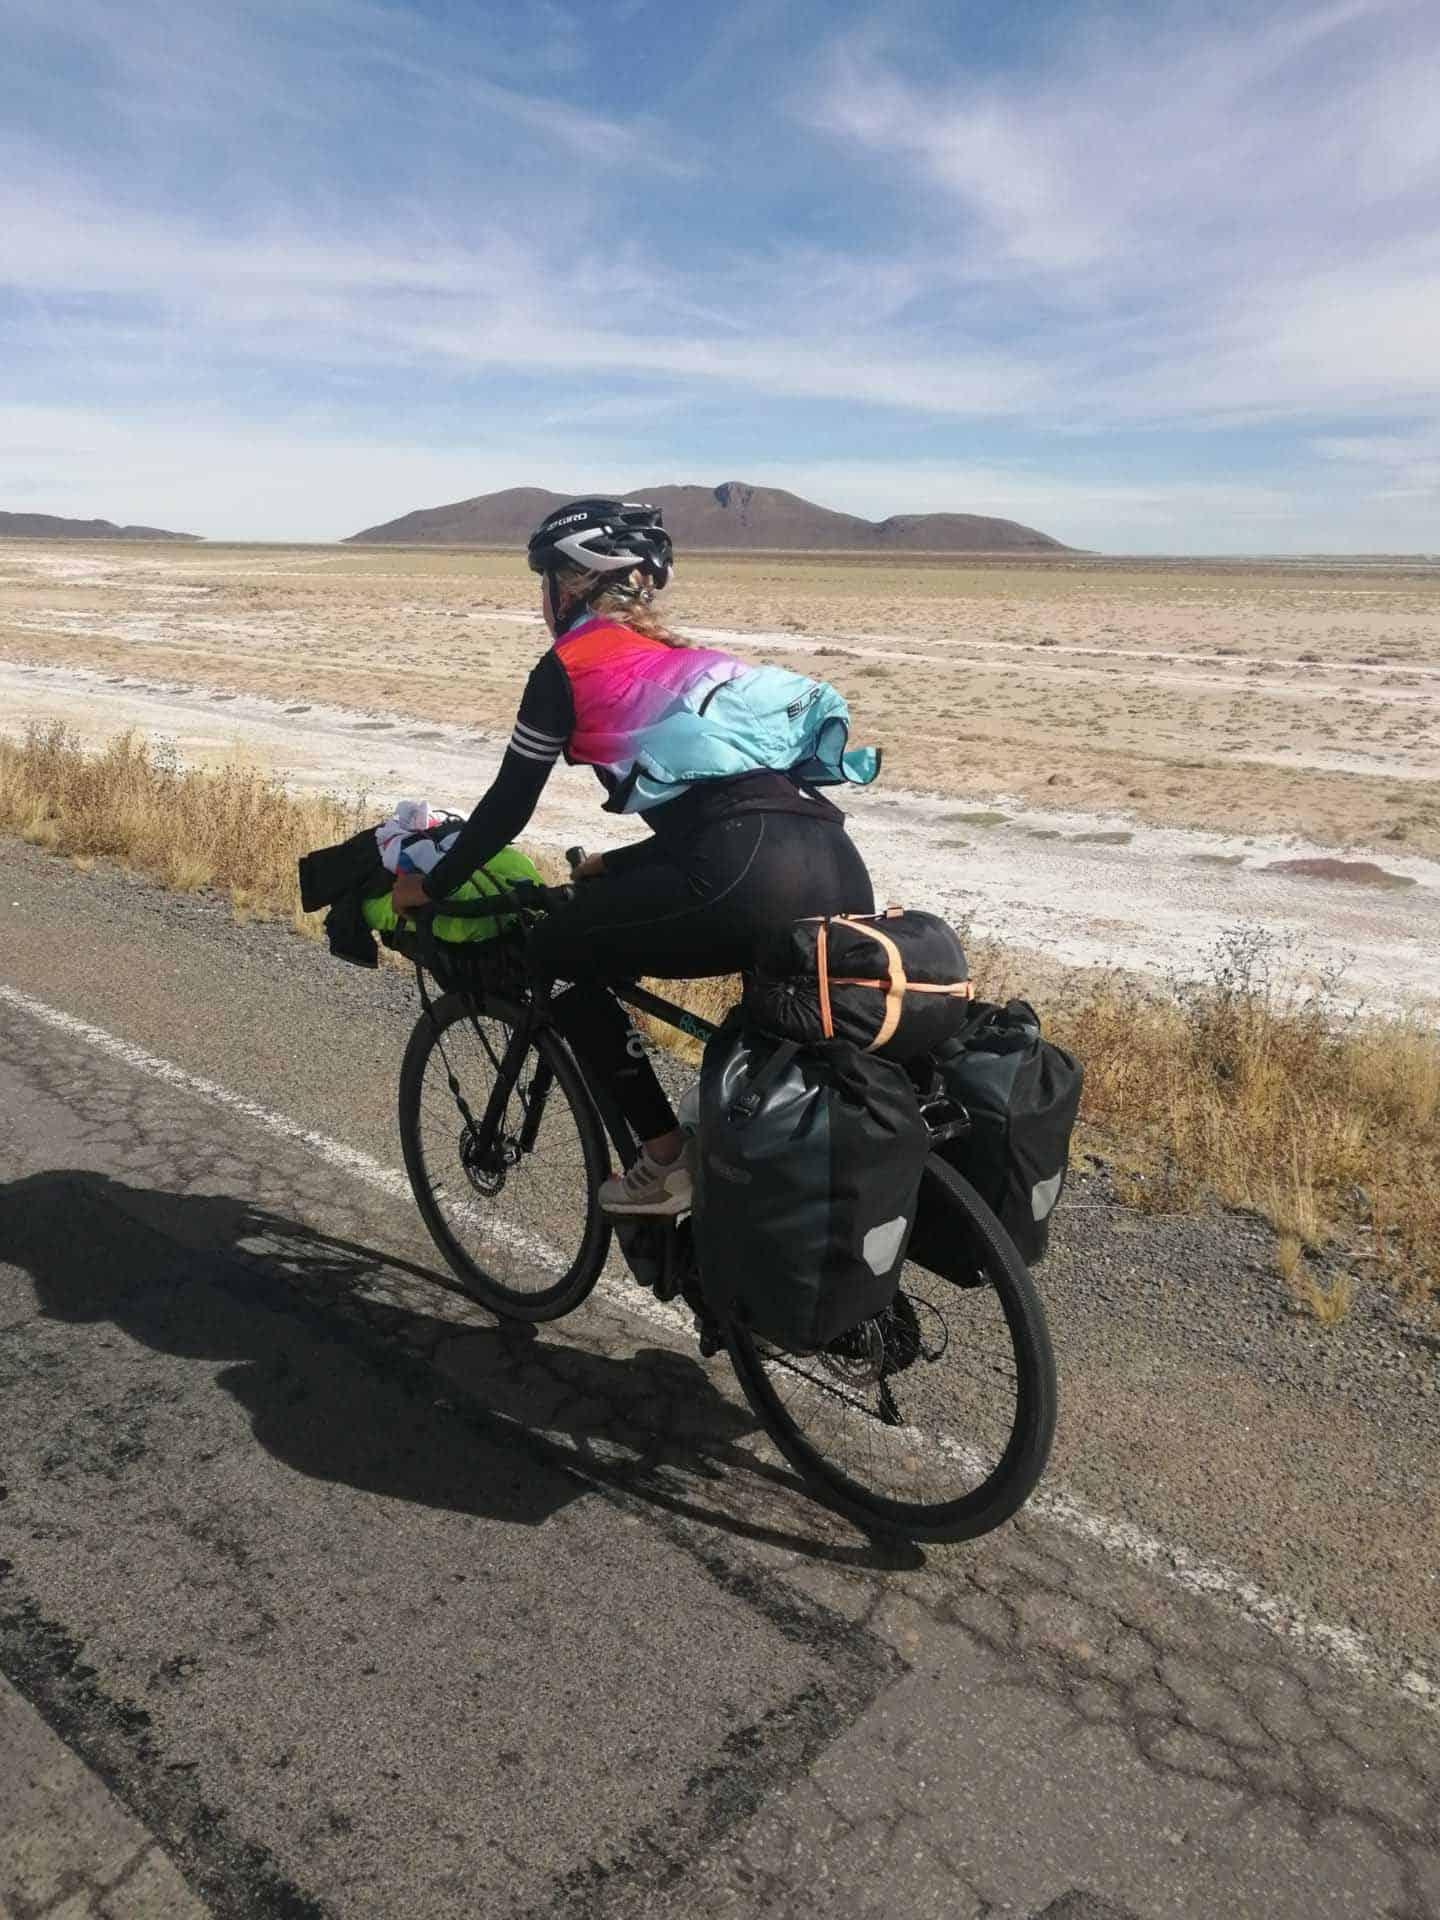 Wiebke in bike touring mode in South America